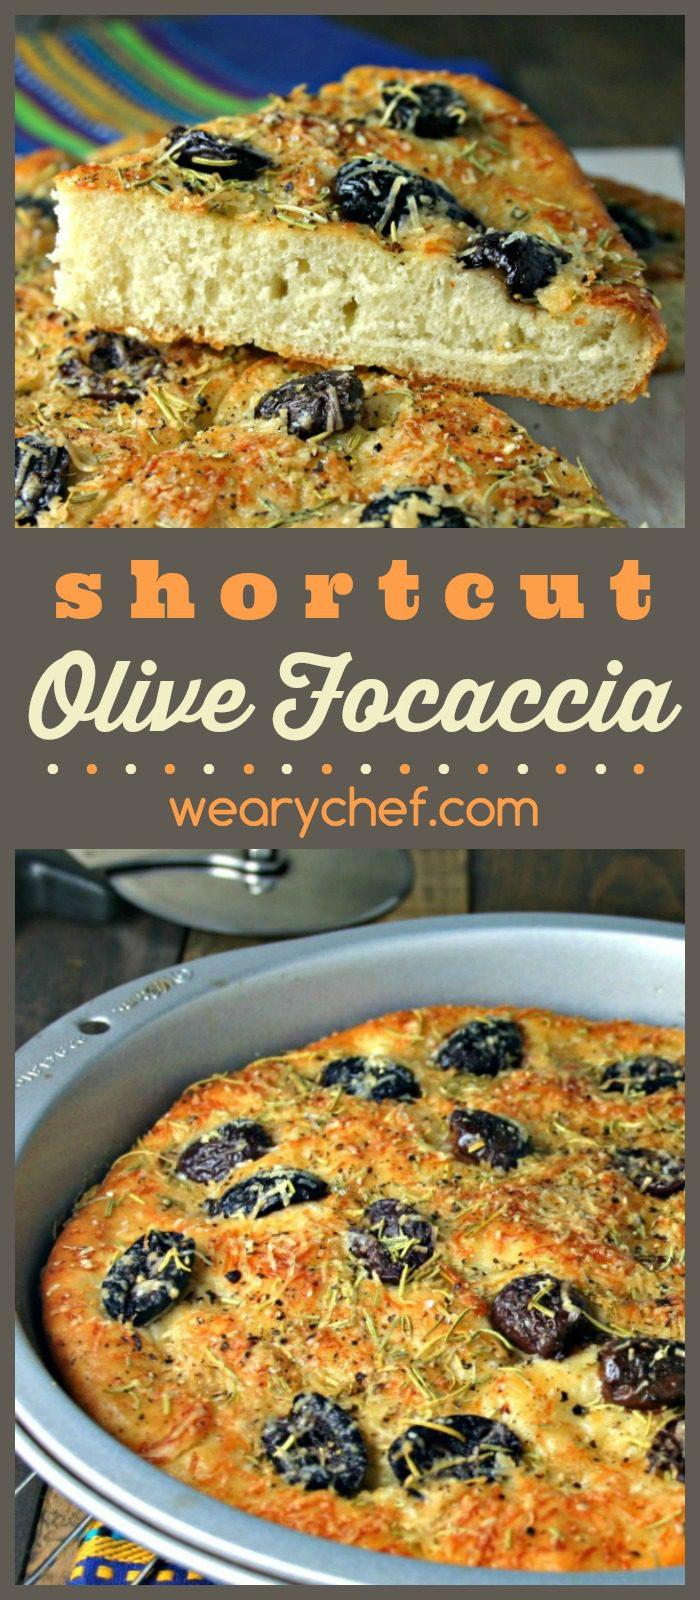 Use premade pizza dough for an easy shortcut to perfect homemade focaccia!